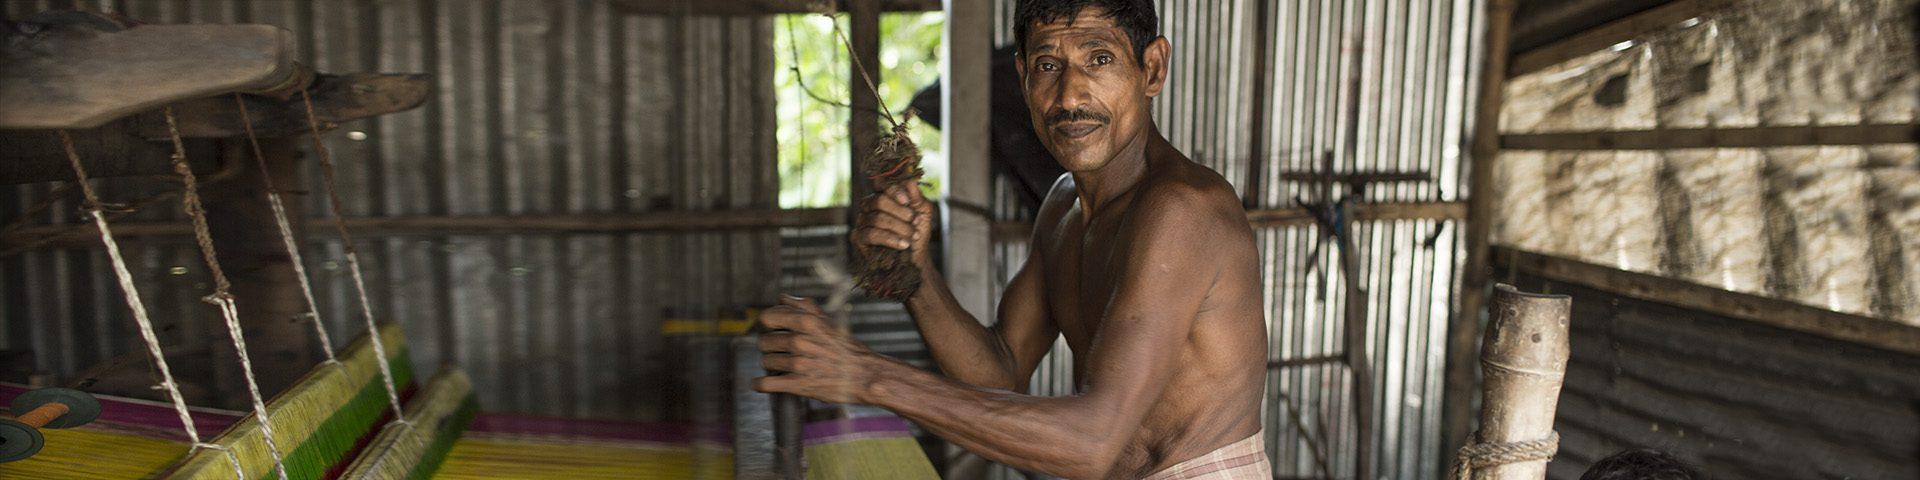 Bangladesh VK 183 ©Mike Roelofs